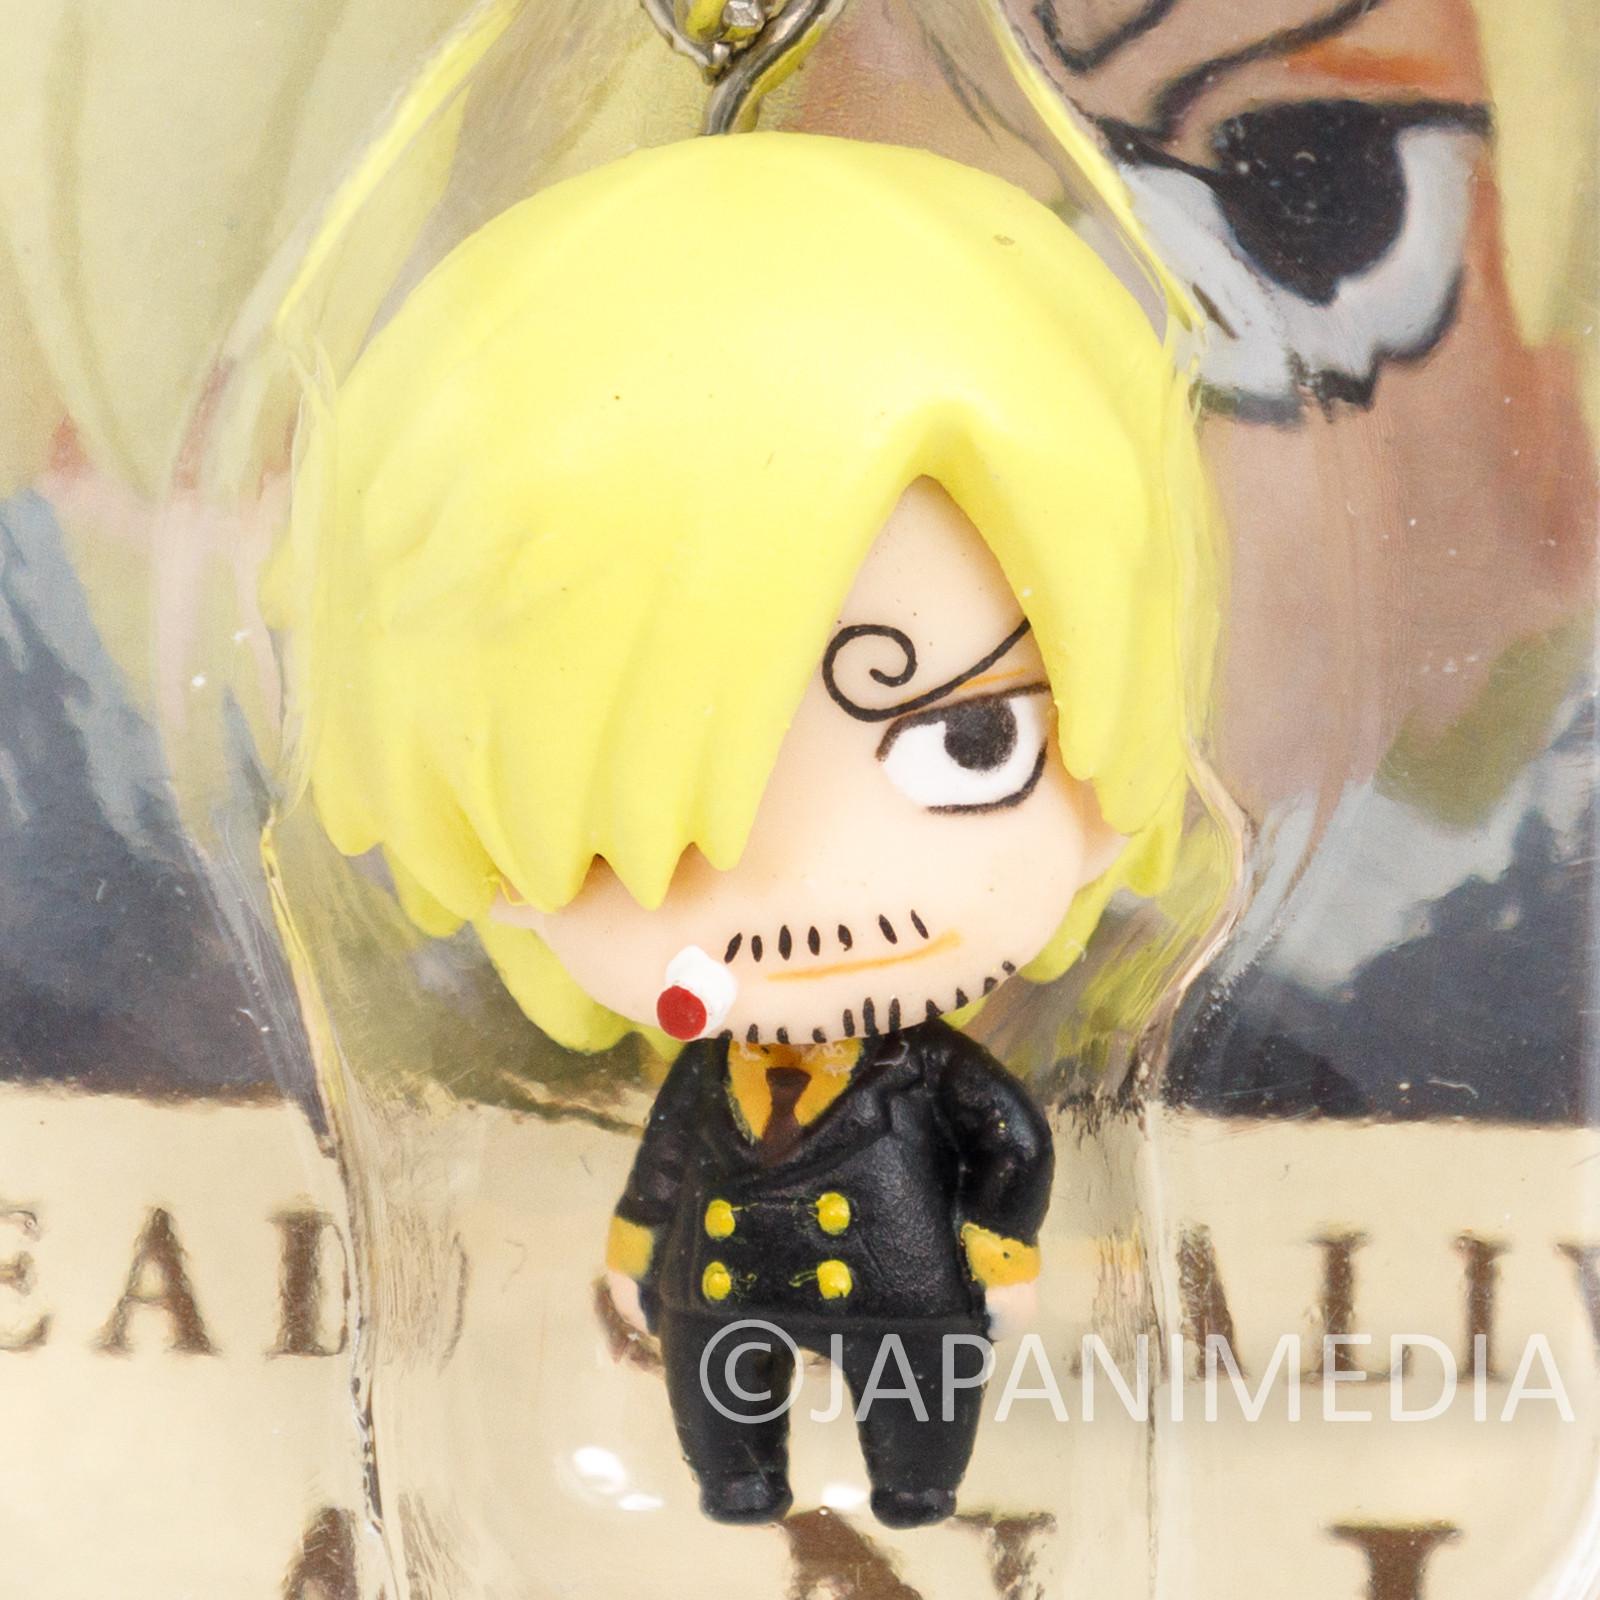 One Piece Vinsmoke Sanji Mini Figure Chara Fortune Megahouse JAPAN ANIME